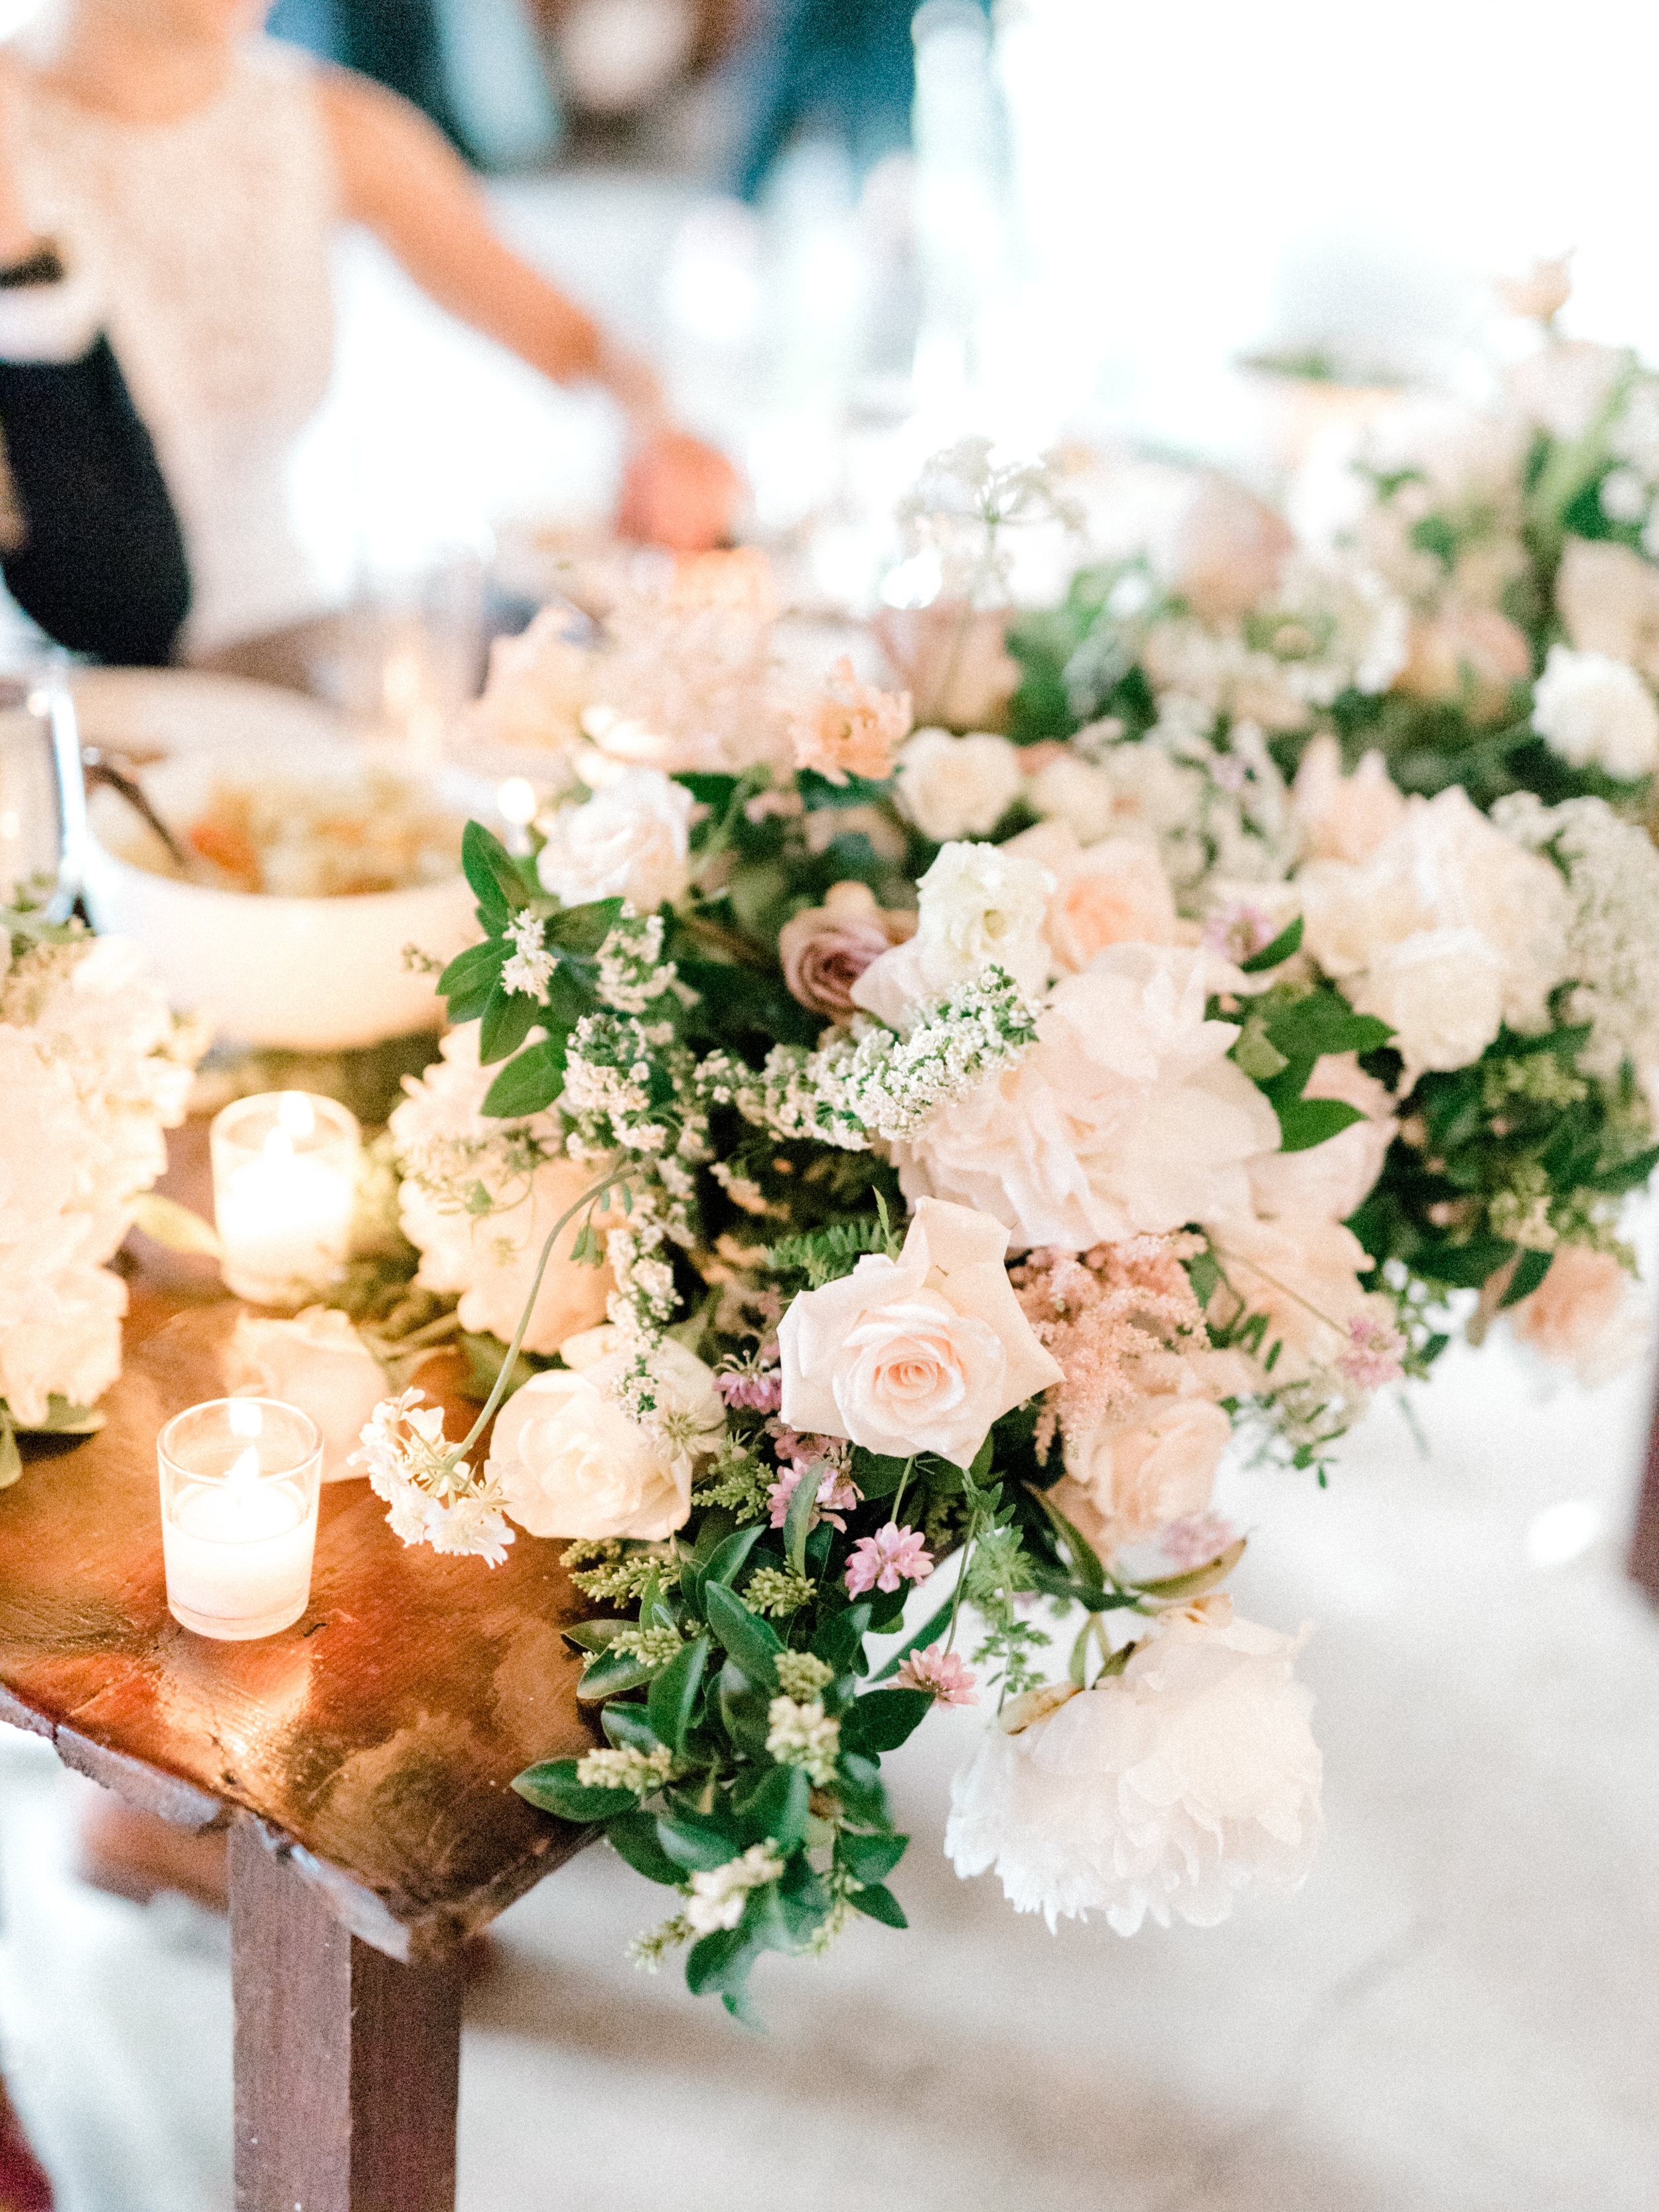 haley-richter-photo-cedar-lakes-estate-wedding-photos-120.jpg